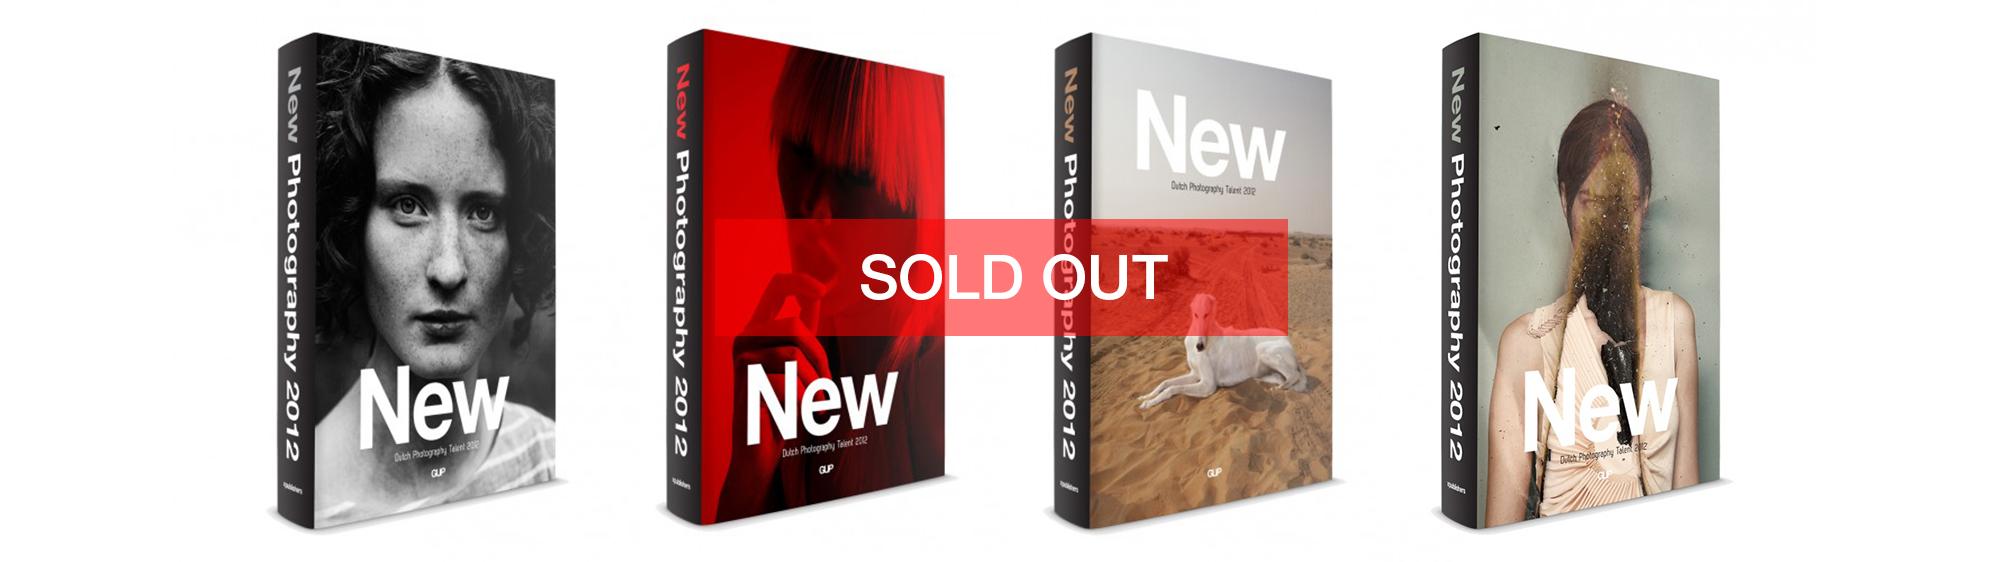 Foreword by Editorial Team  Cover images © Isabella Rozendaal / Aukje Dekker & Aisha Zeijpveld / Lieke Romeijn / Ron Logher